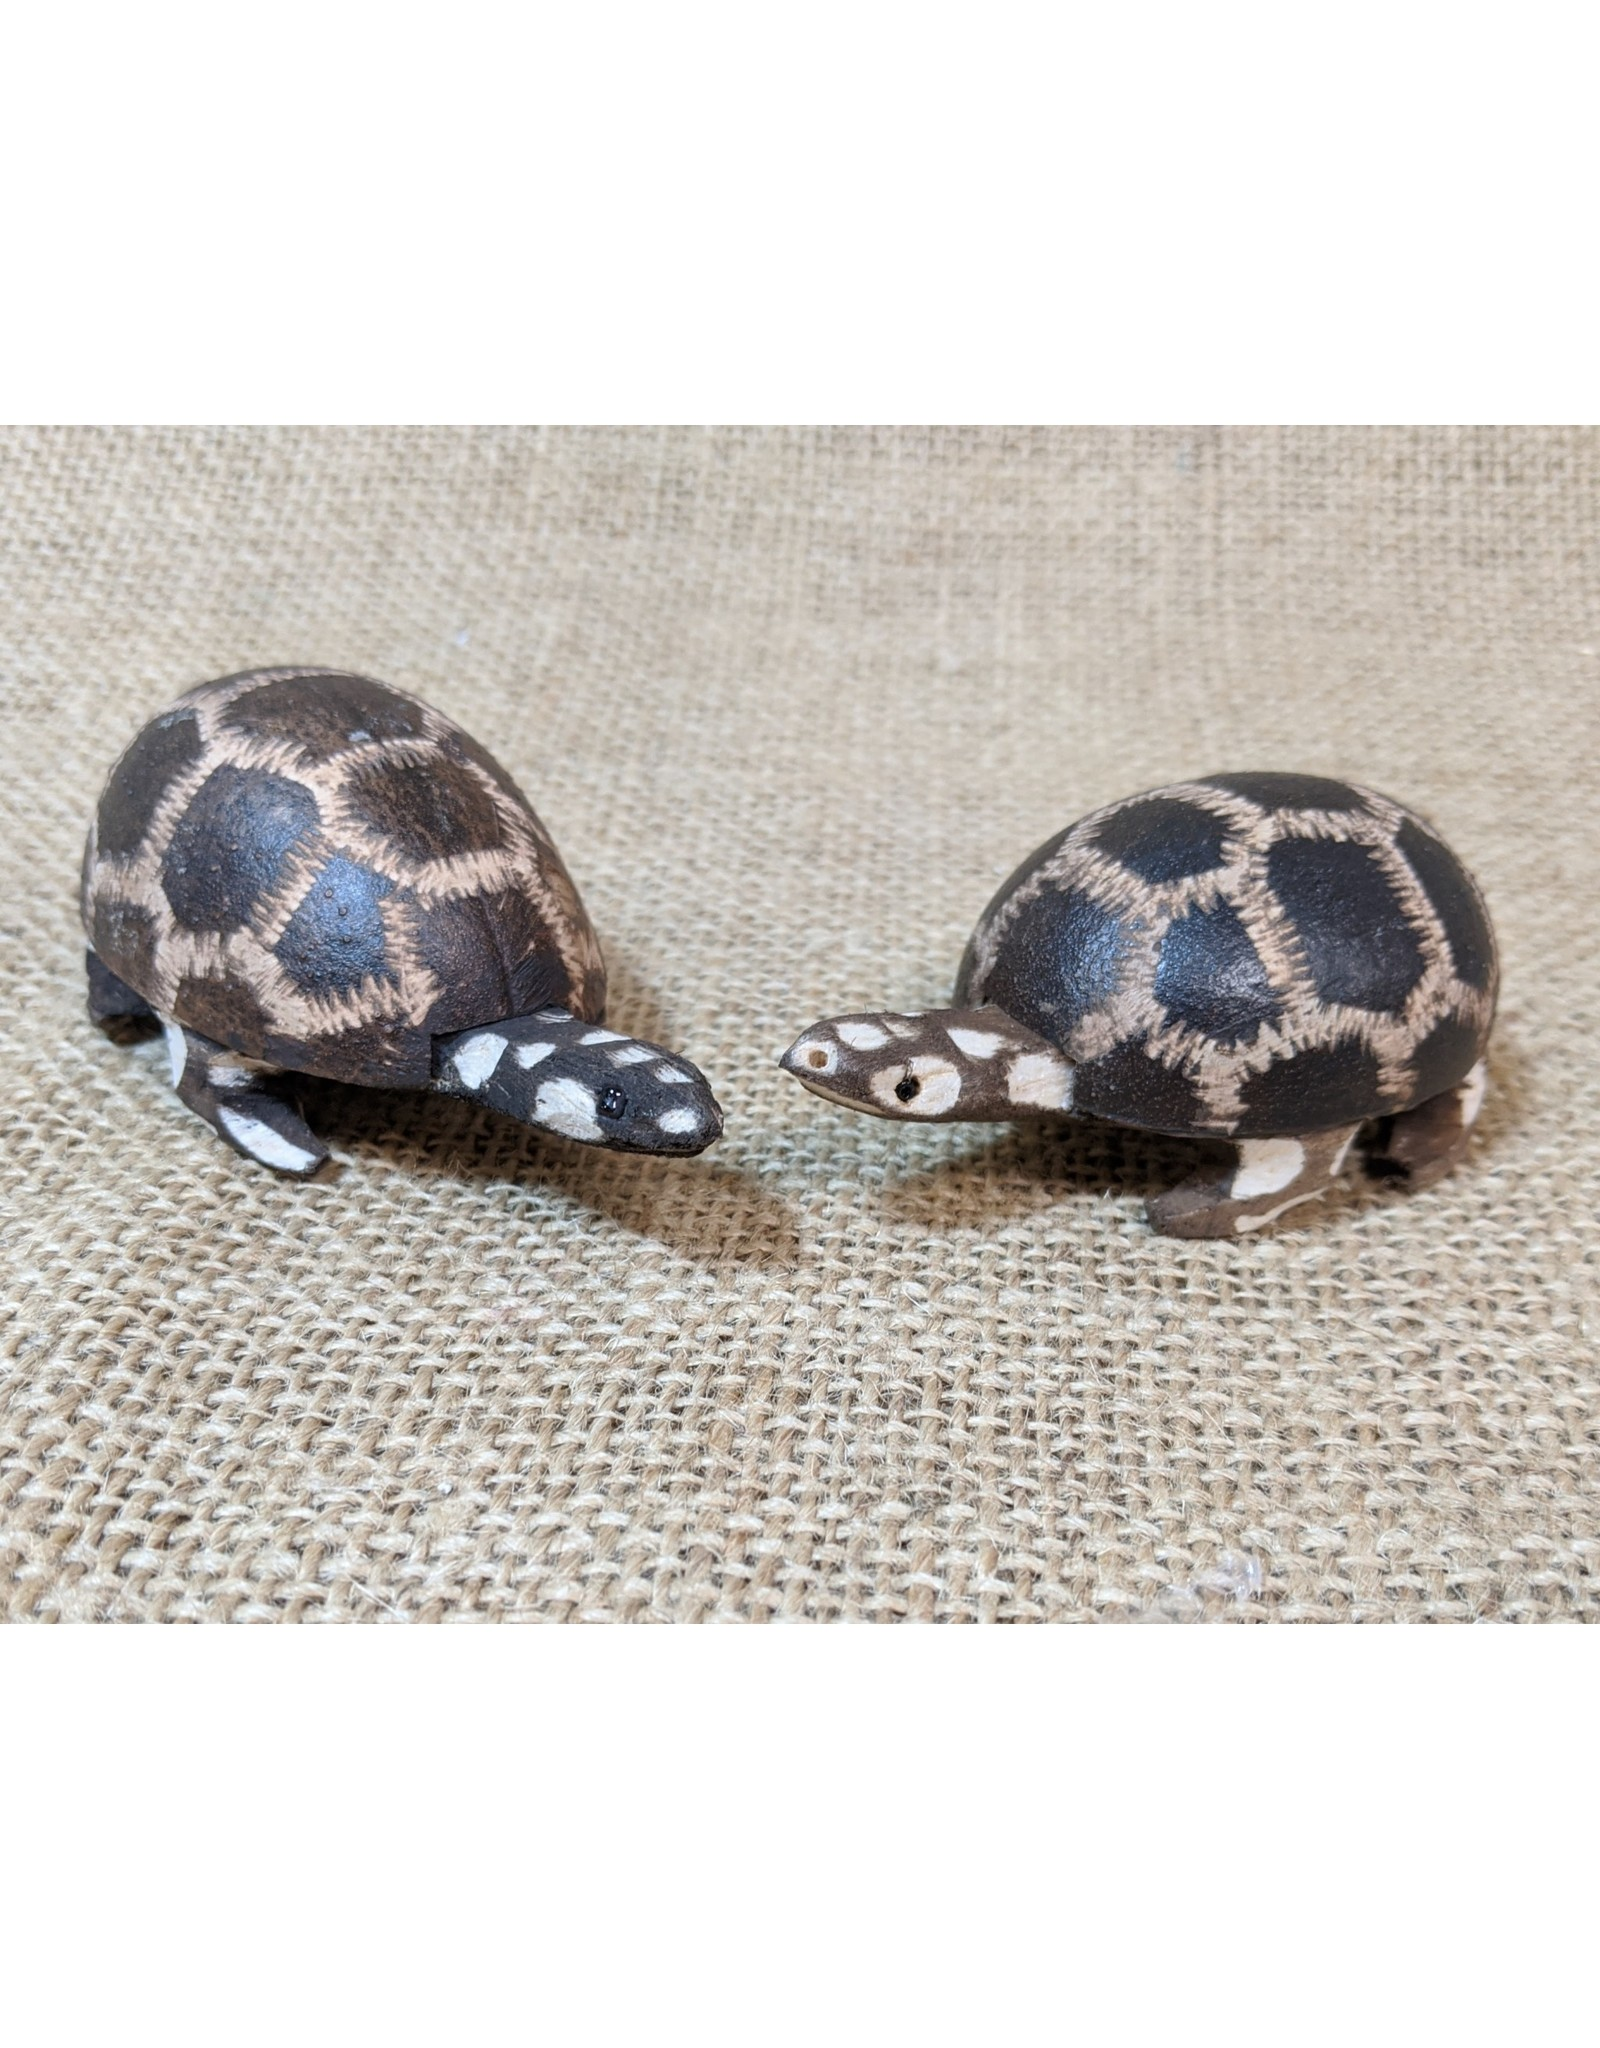 Jamtown Baby Wingo Turtle Shaker